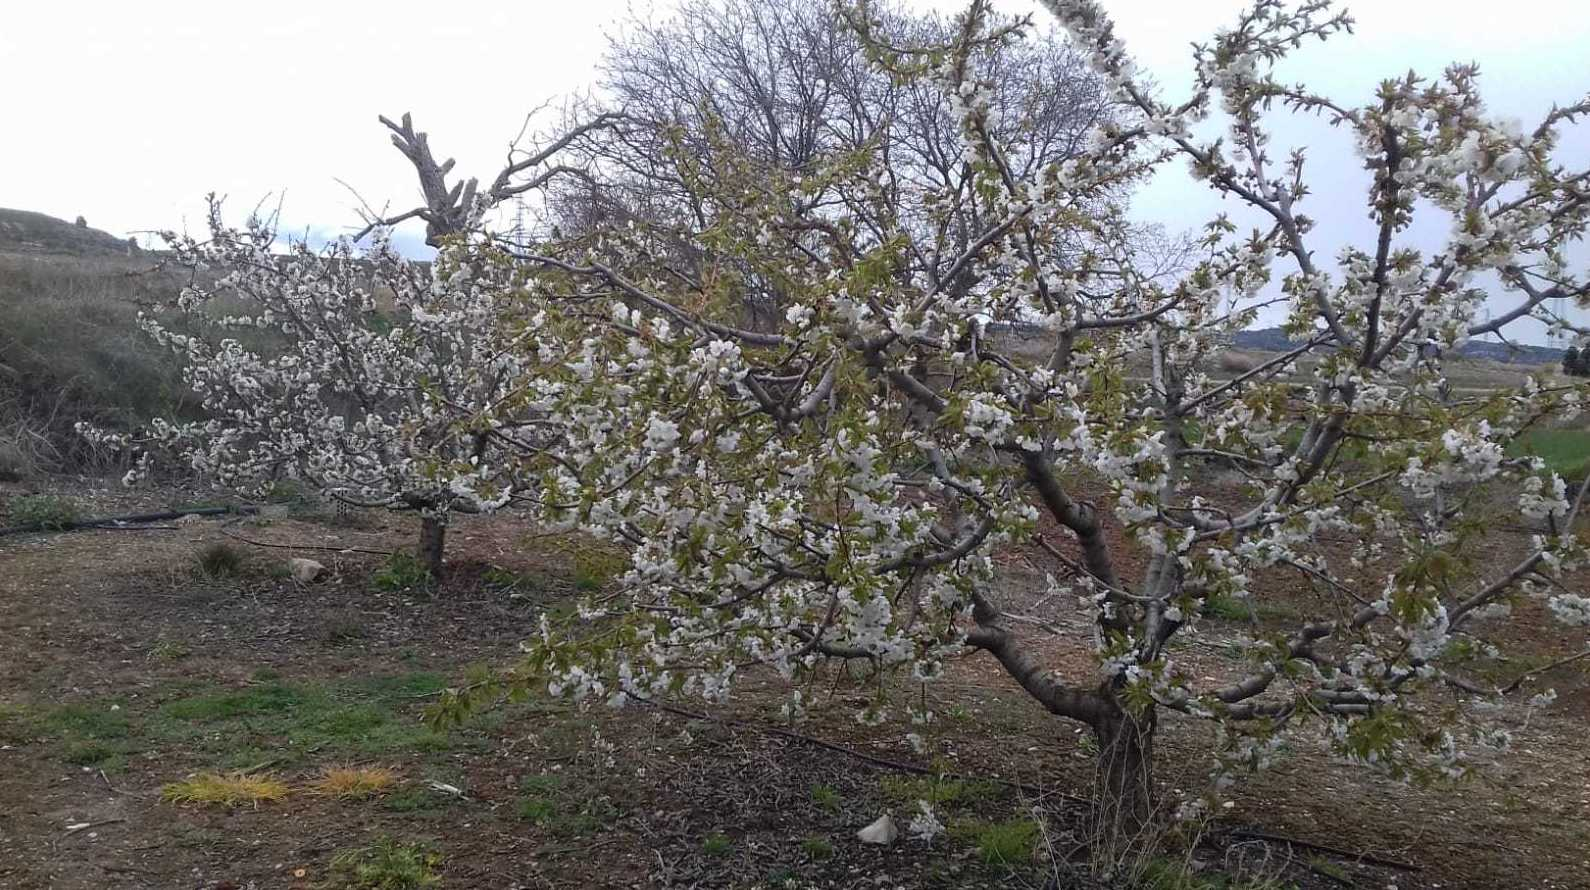 Picture 7 of Asesores agrarios in El Burgo de Ebro | Asesores Agrarios Rifaterra